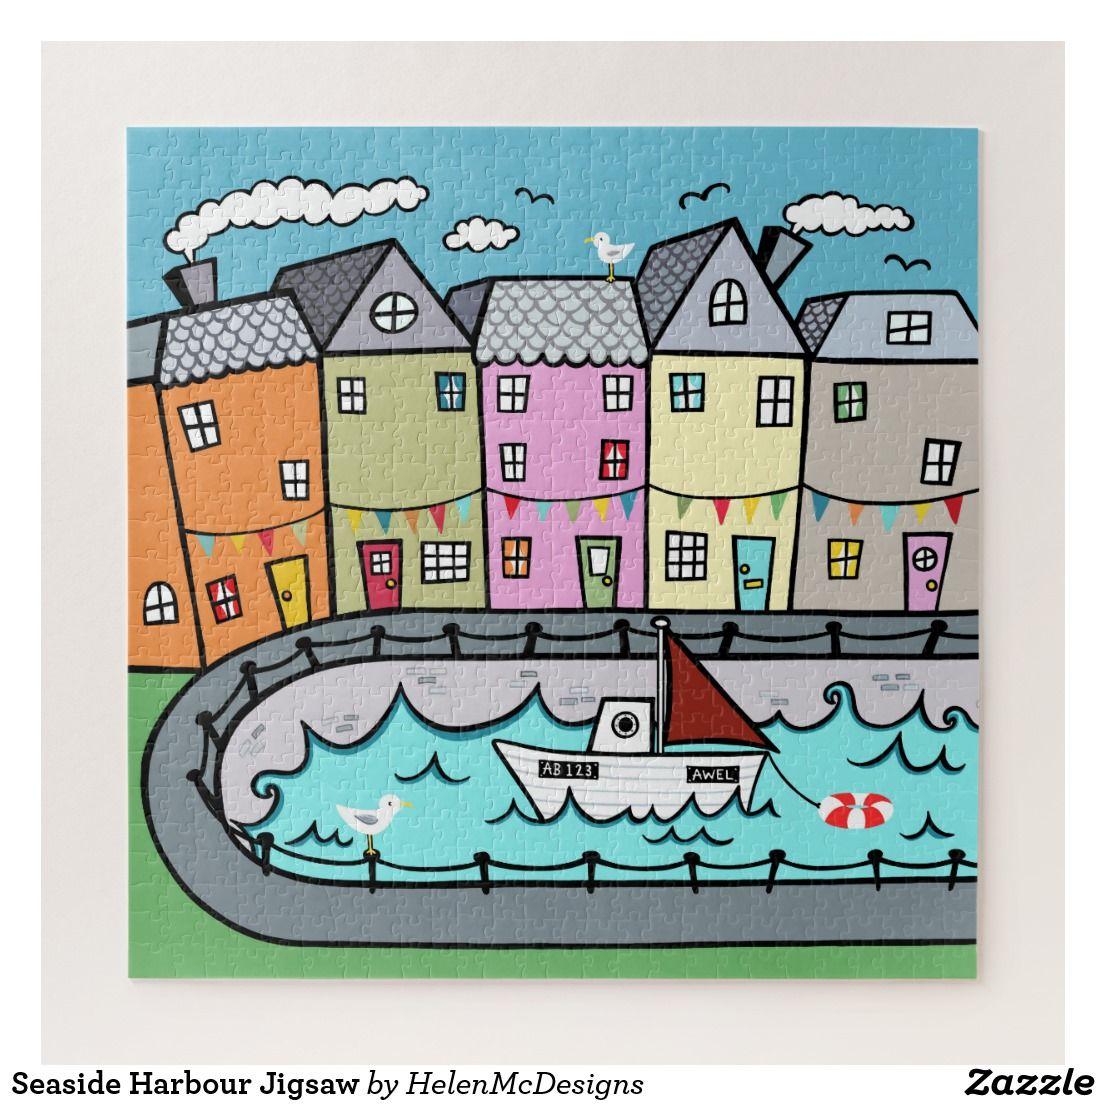 Seaside Harbour Jigsaw Jigsaw Puzzle